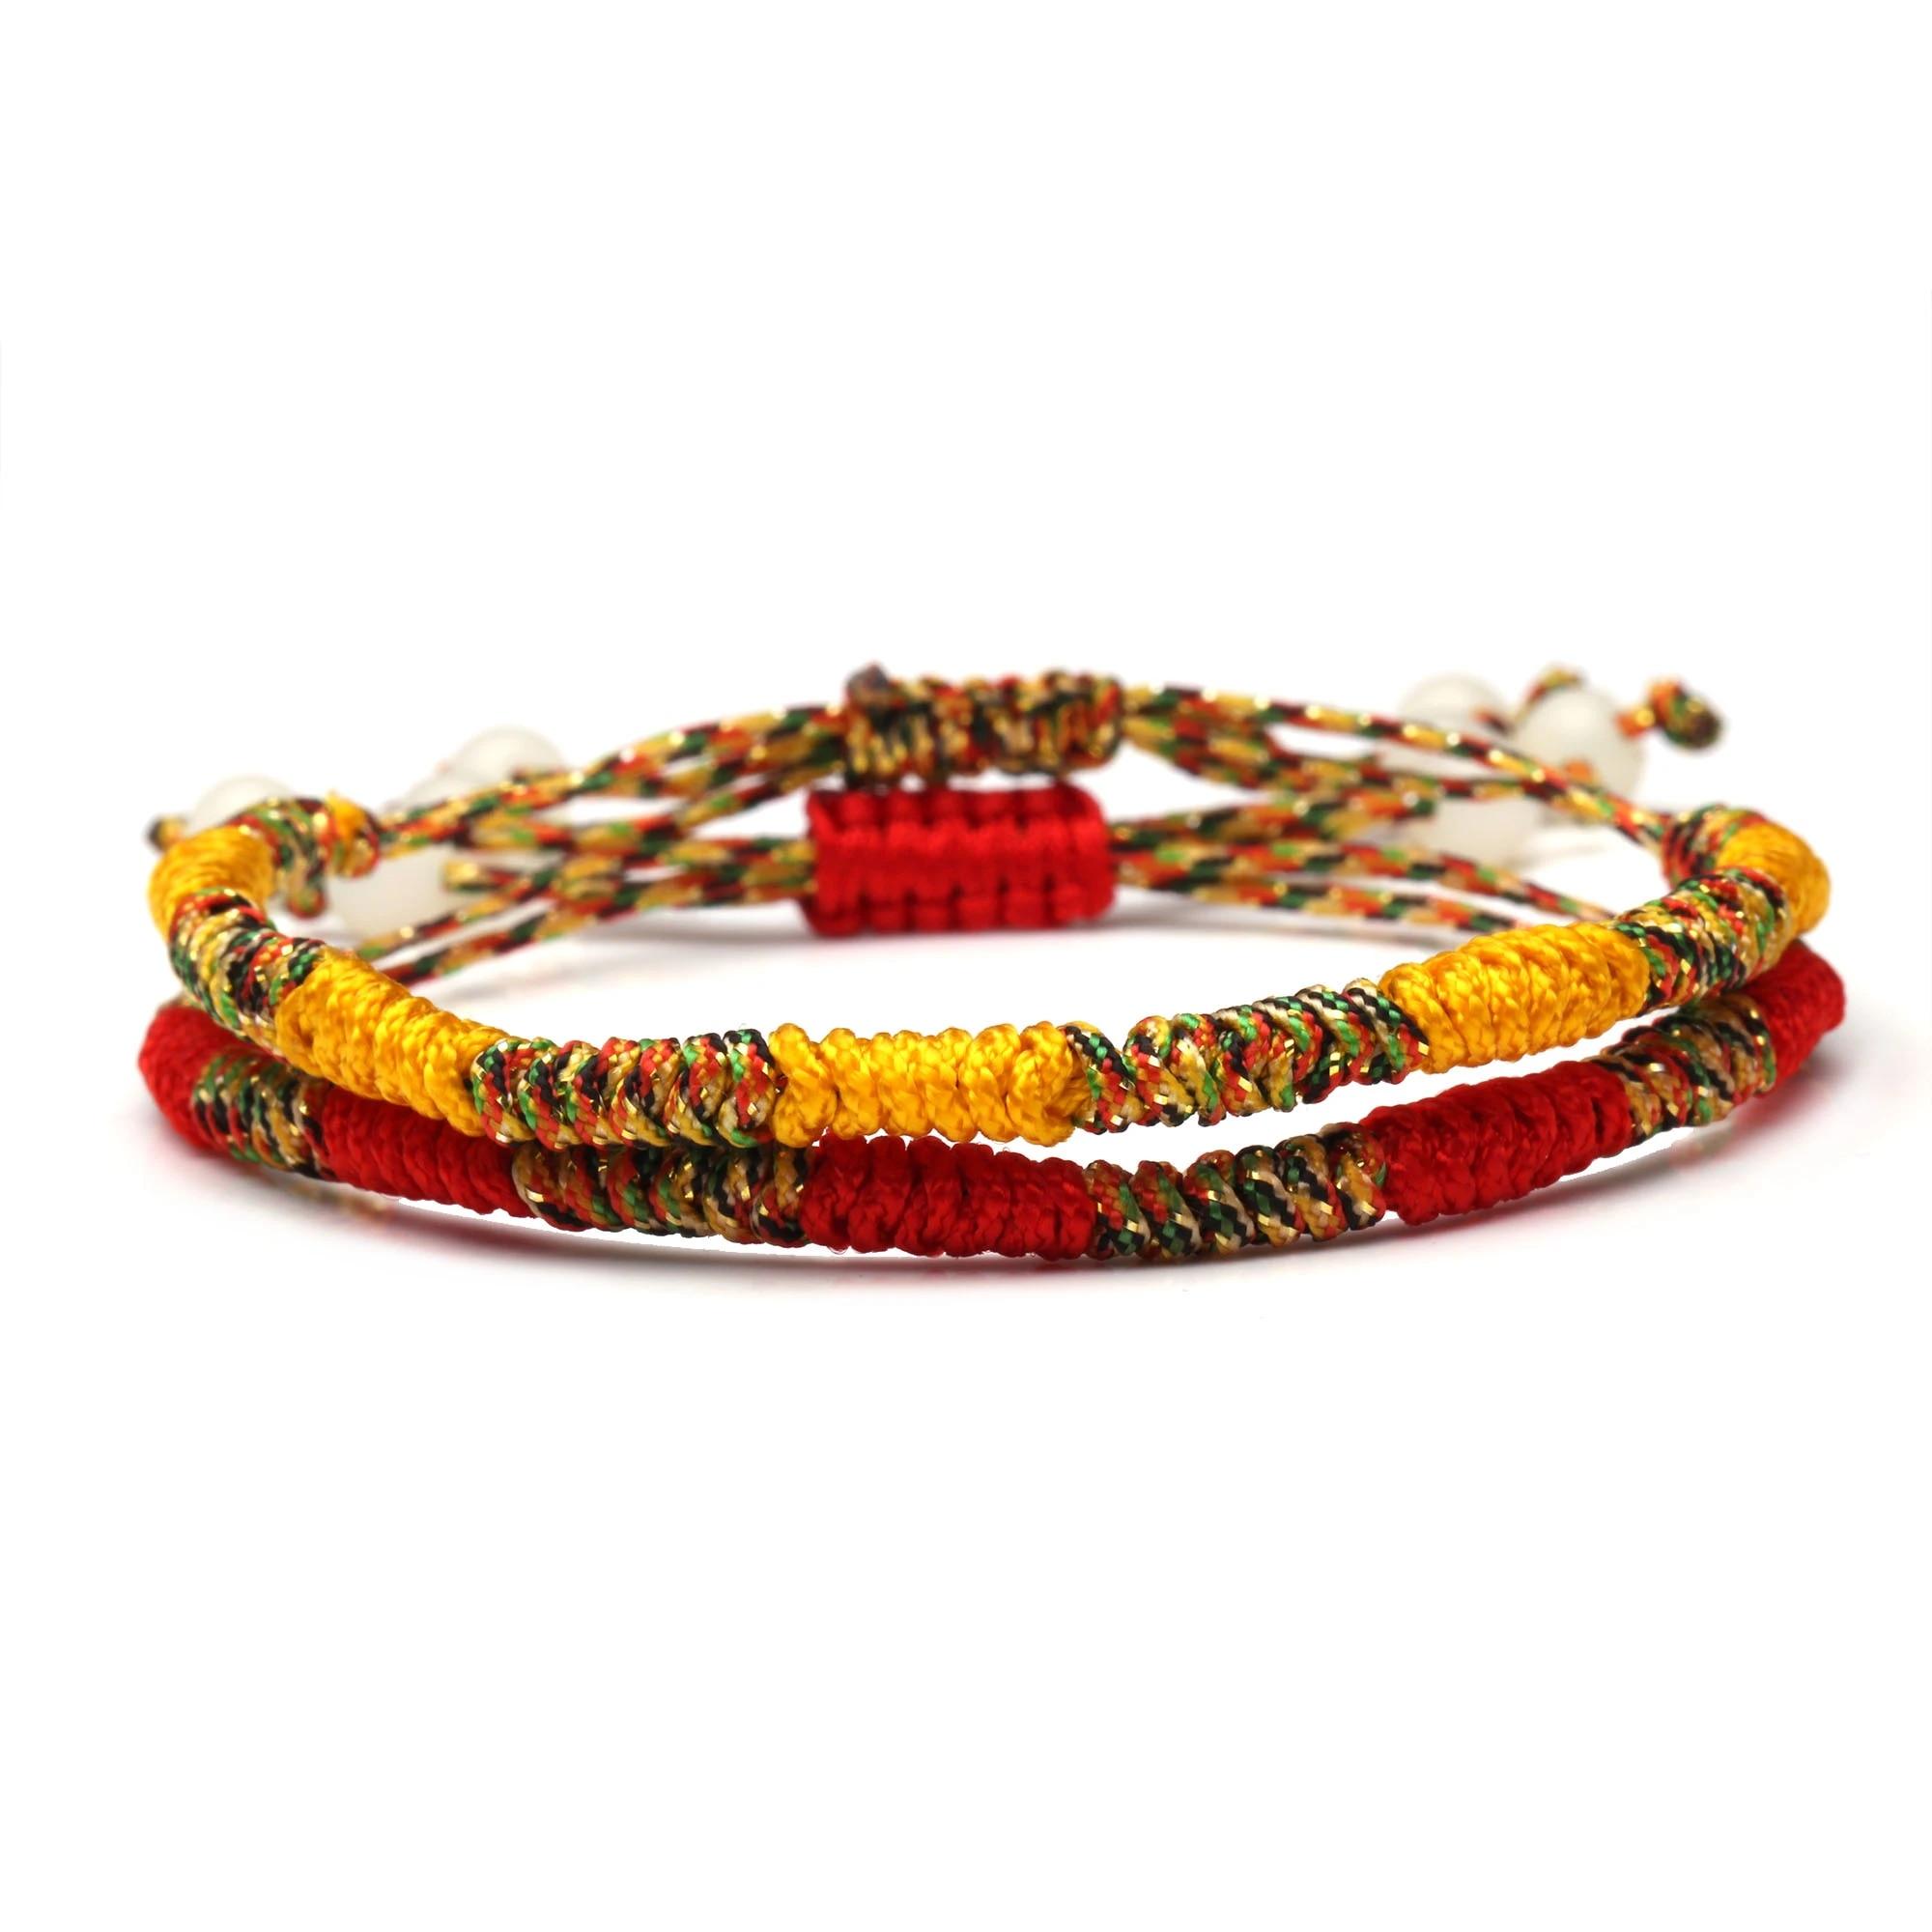 2or 6 pcs//Set Tibetan Adjustable Woven Rope Bracelet for Protection and Luck Red and Color kelistom Handmade Buddhist String Bracelets for Women Men Boys Girls